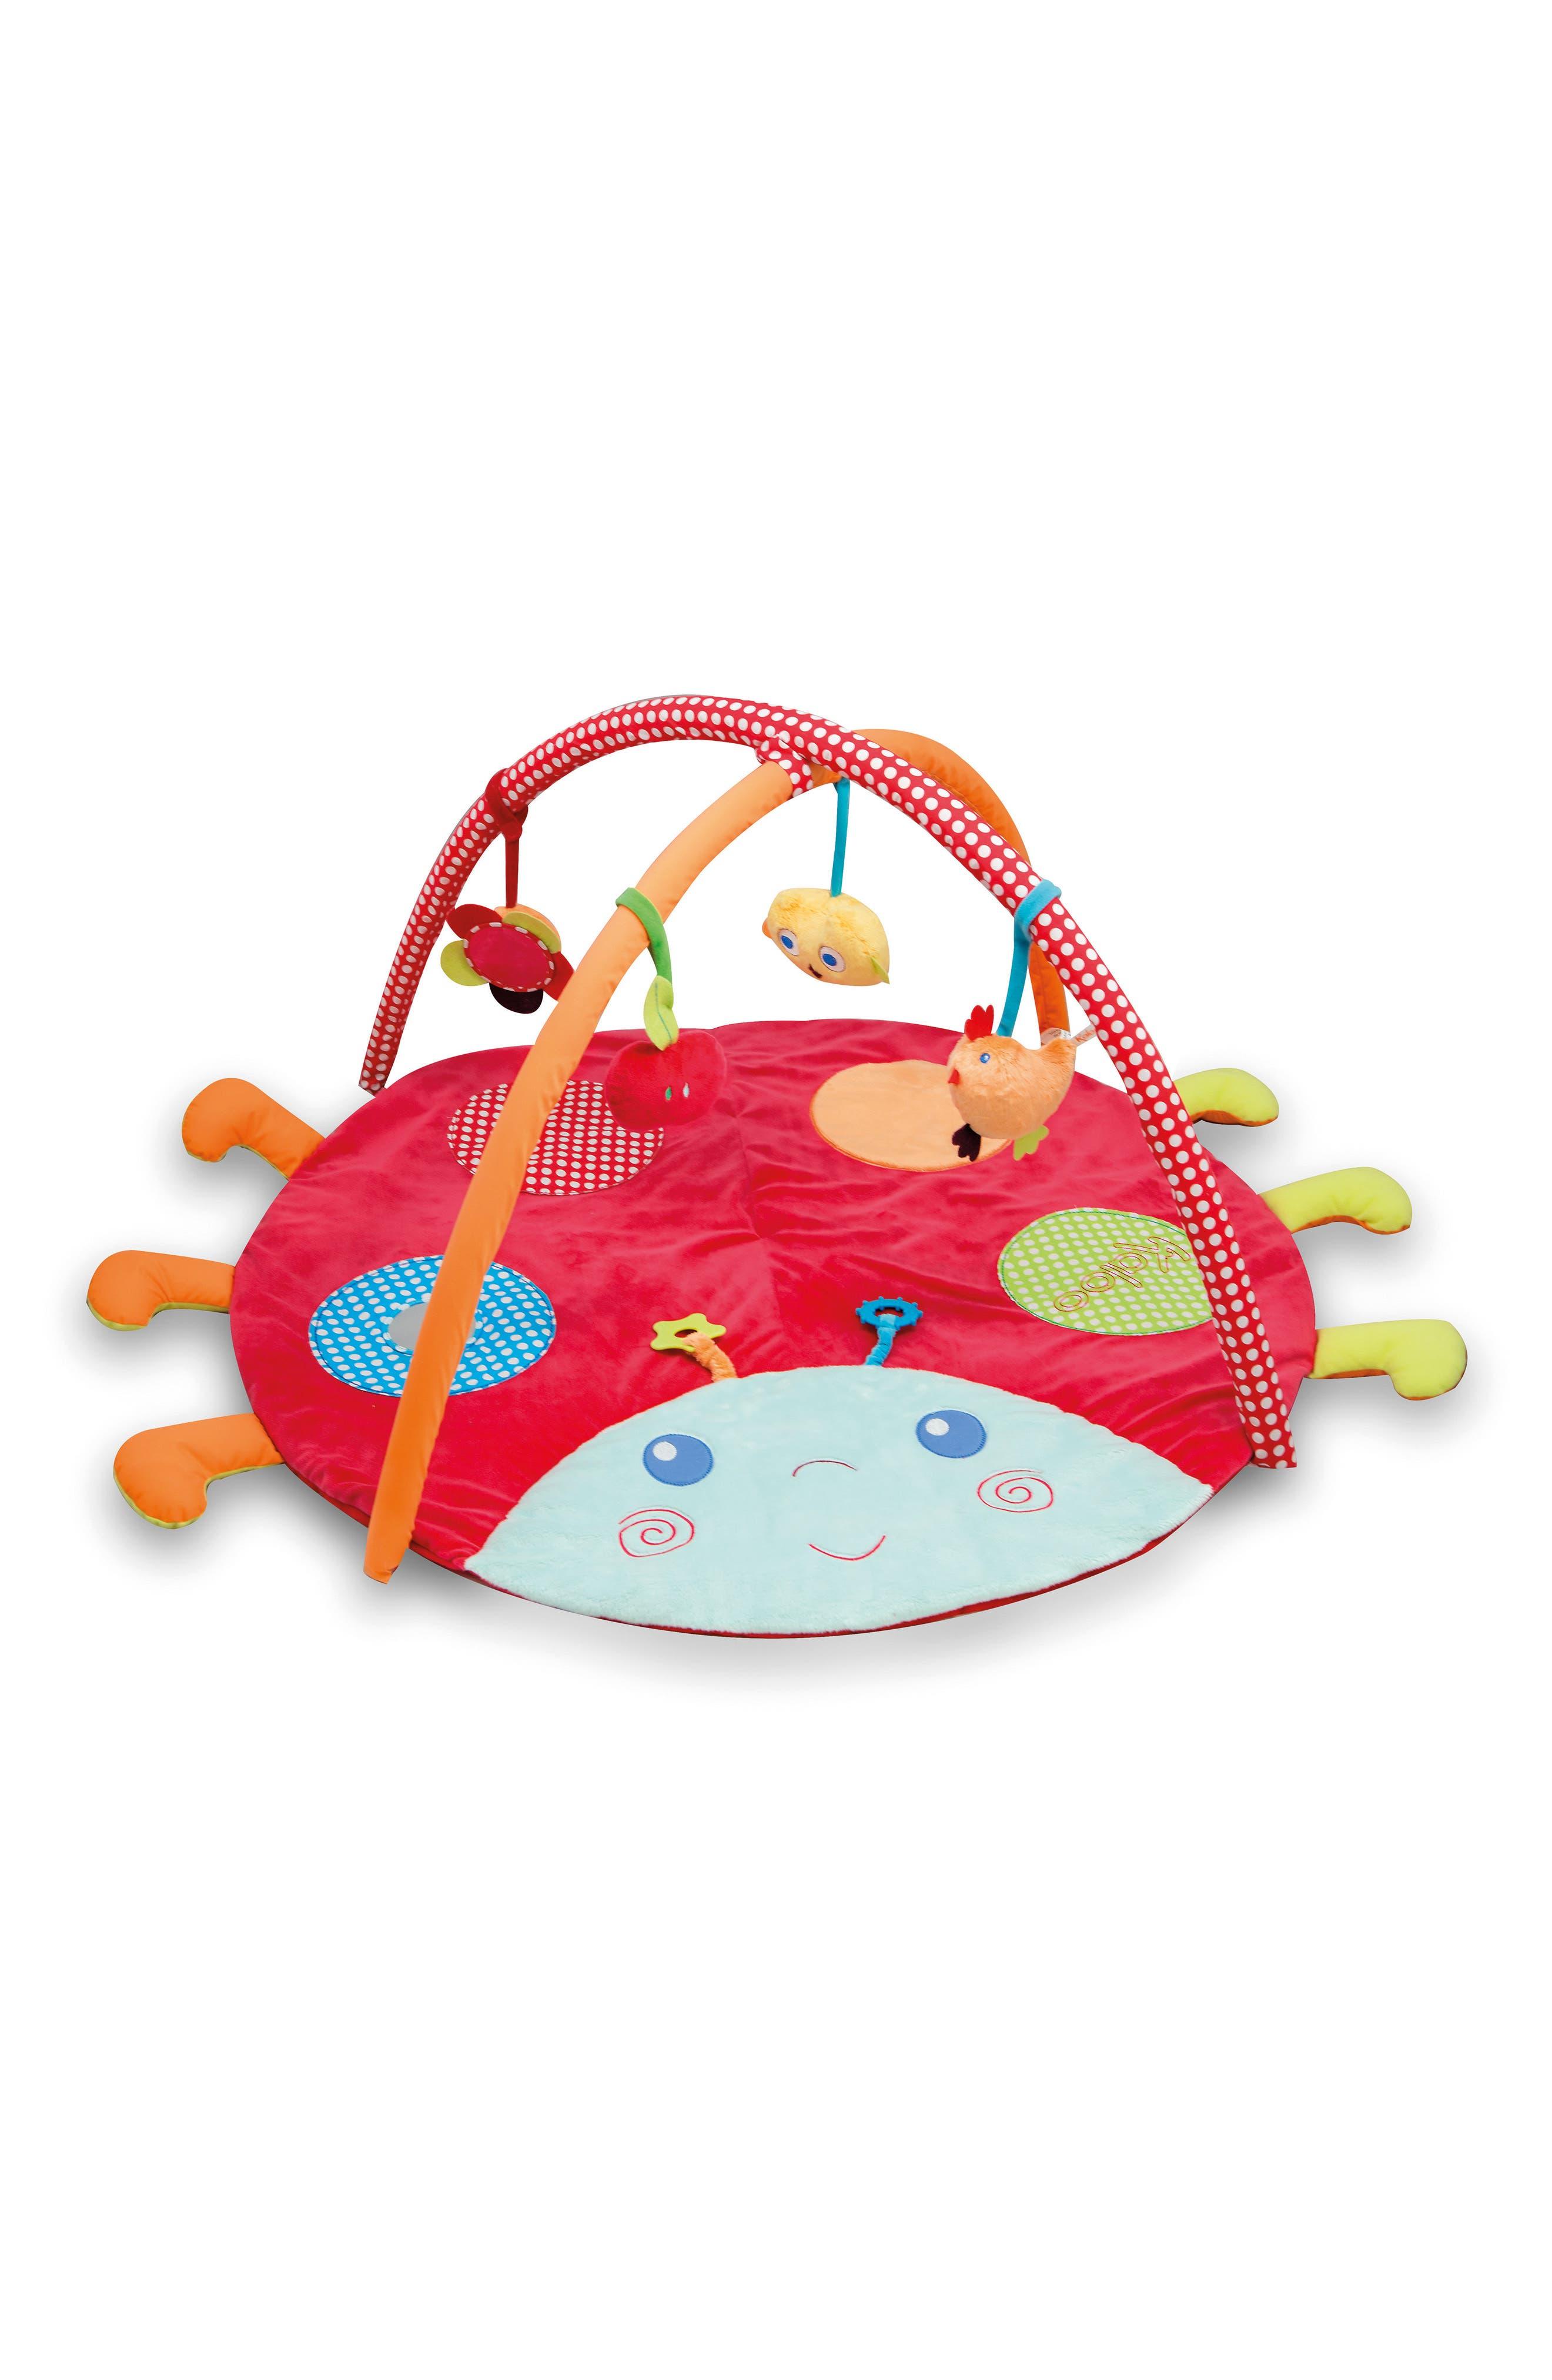 Alternate Image 1 Selected - Kaloo Ladybug Play Mat